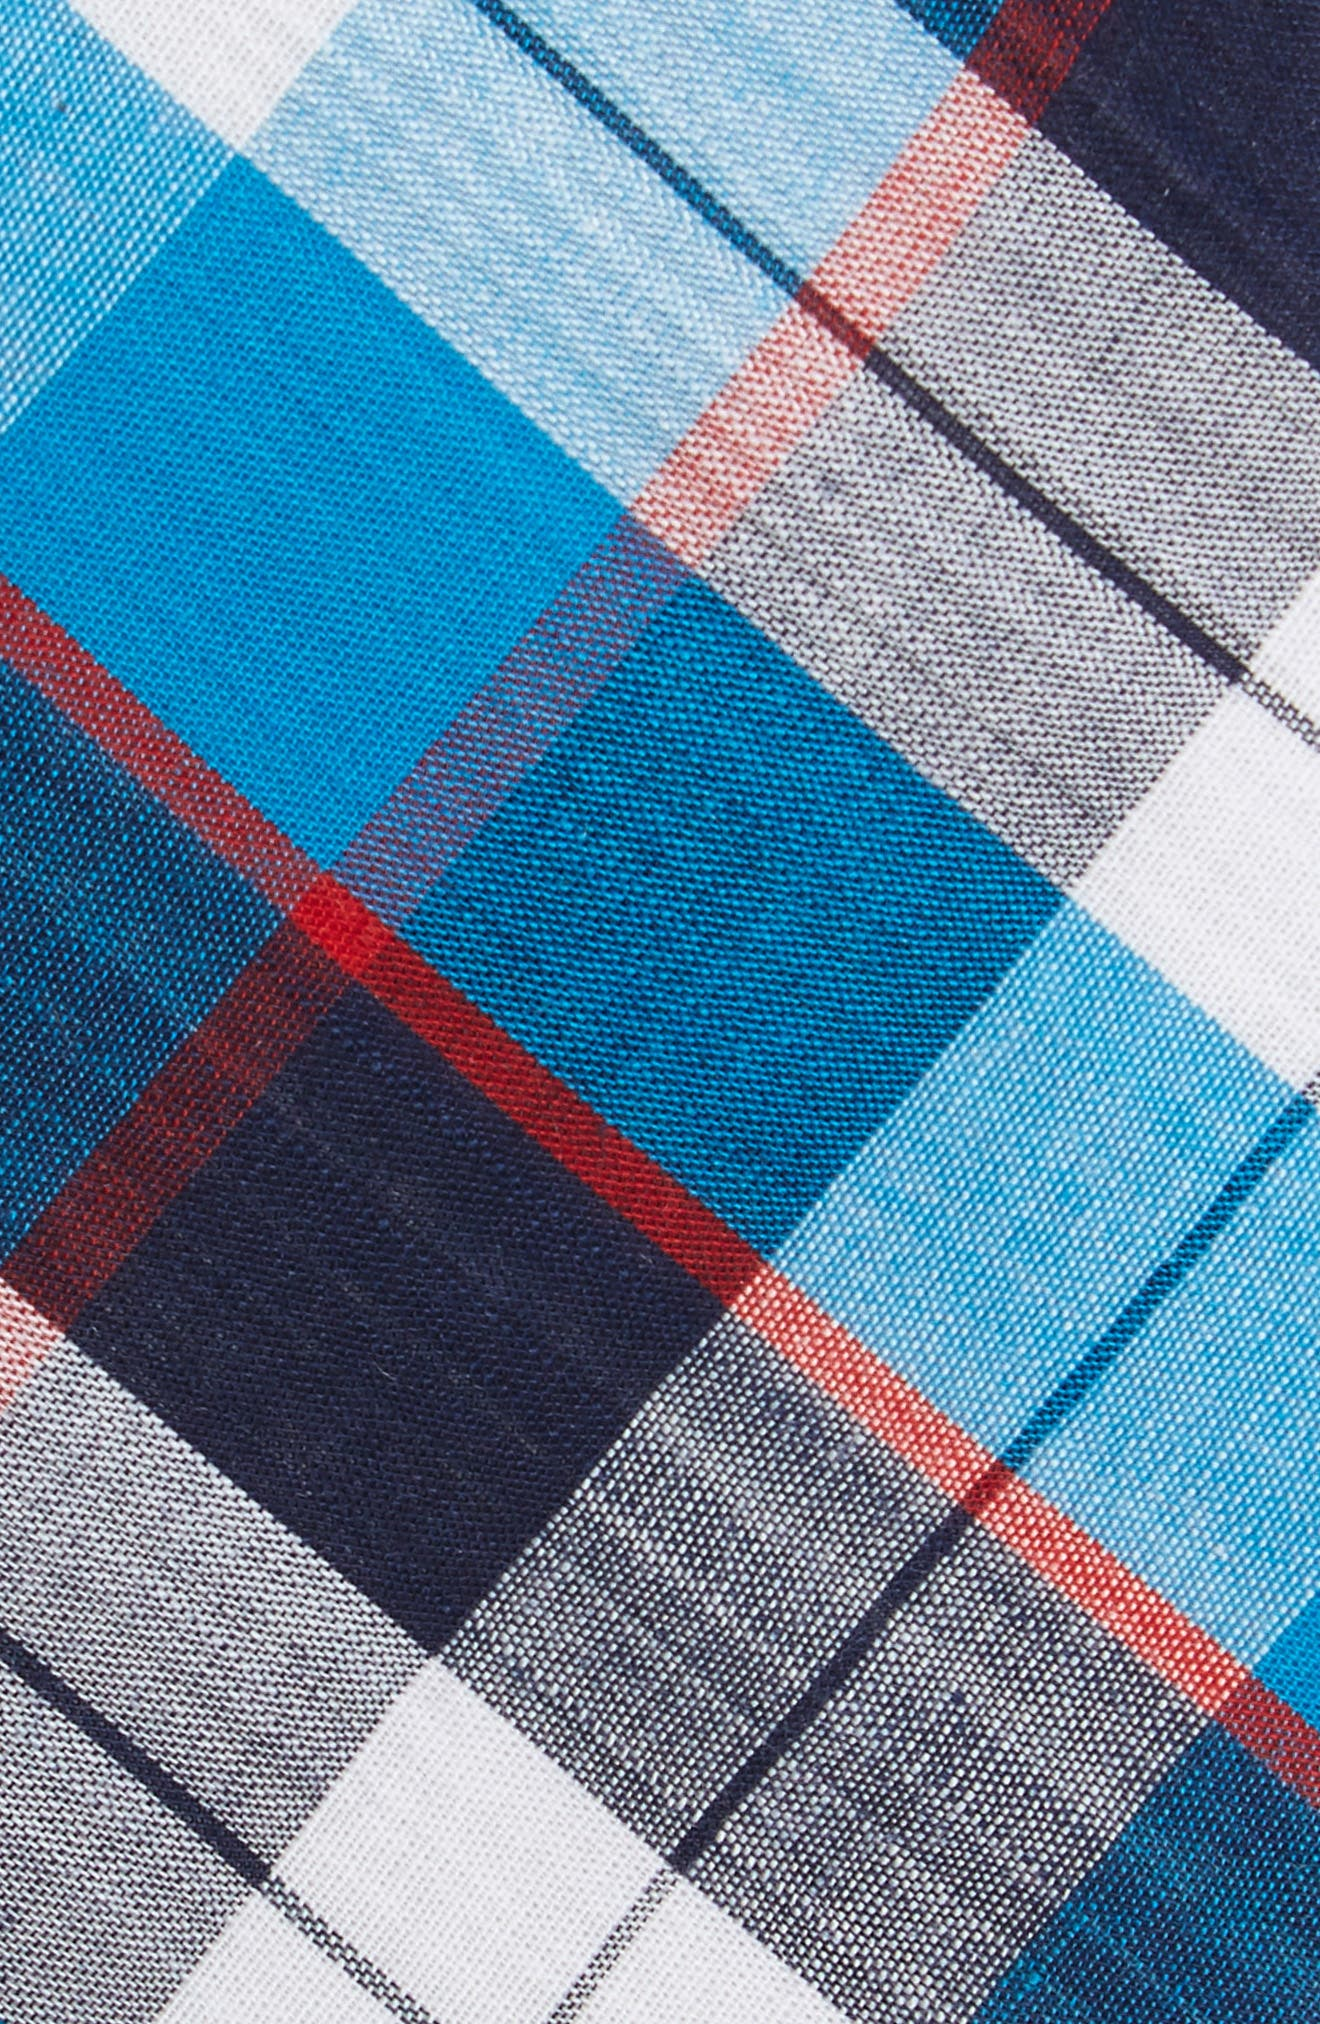 Esterbrook Plaid Cotton Skinny Tie,                             Alternate thumbnail 2, color,                             Navy